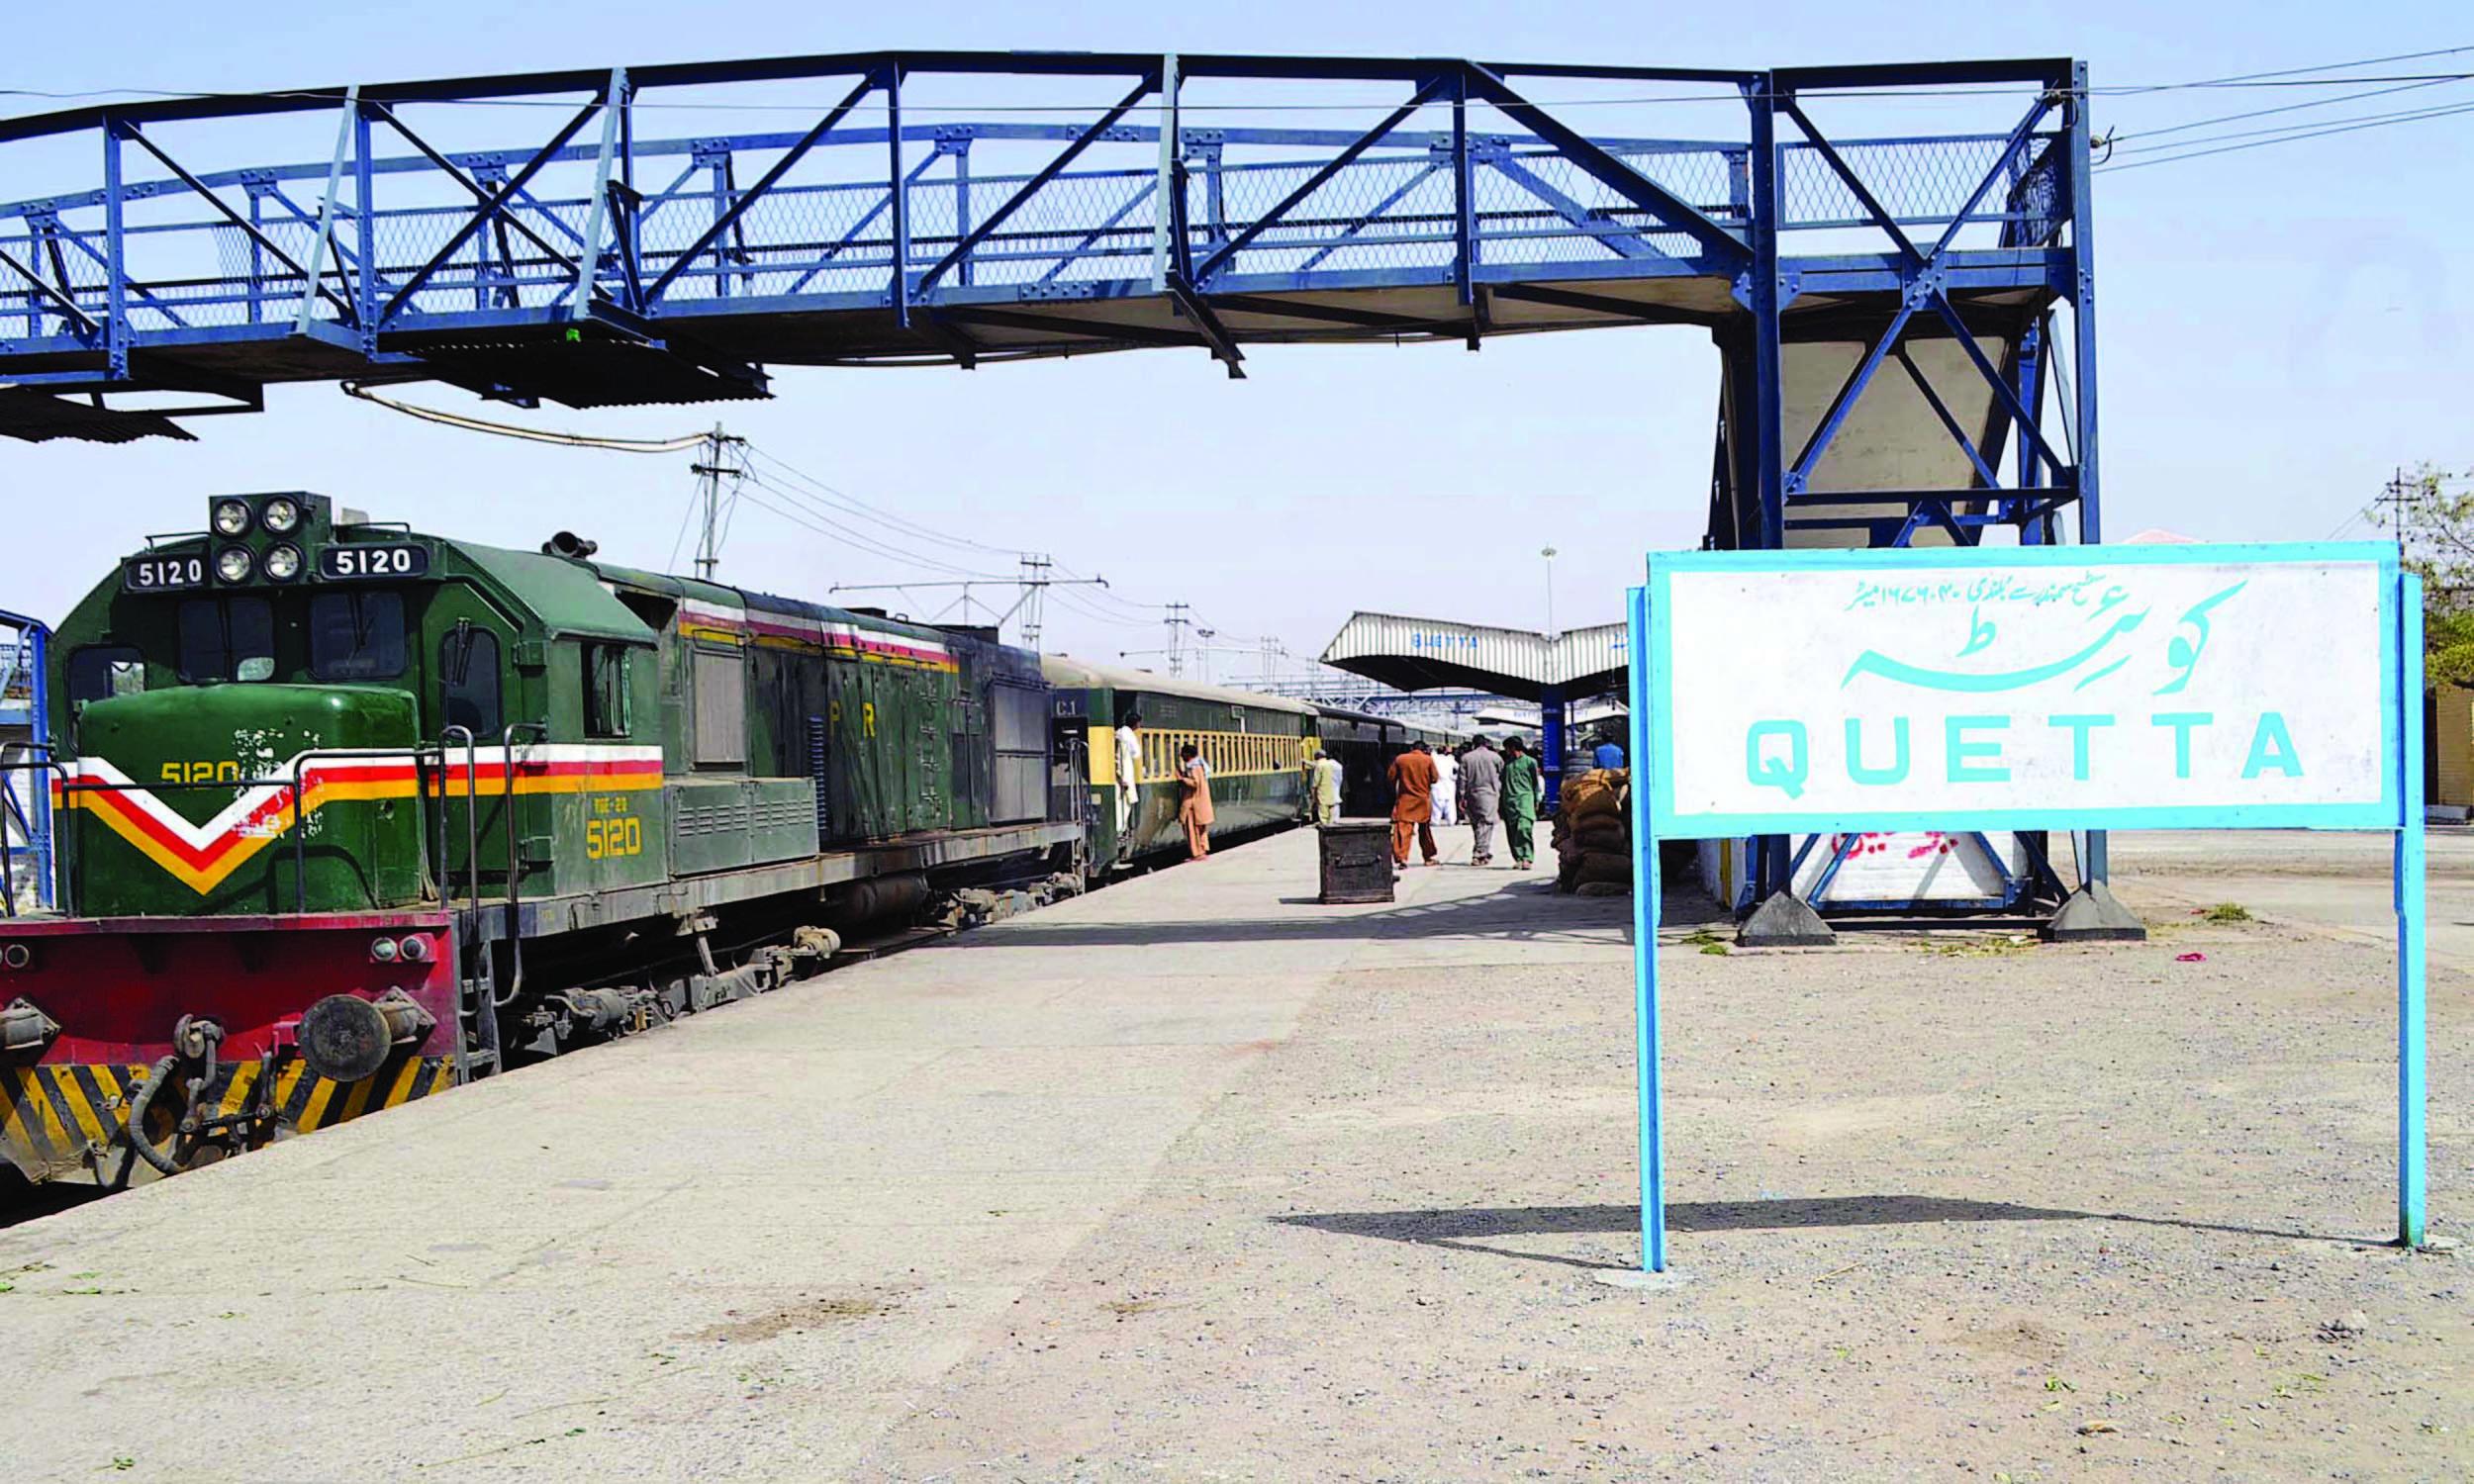 A view of a train platform in Quetta | Banaras Khan